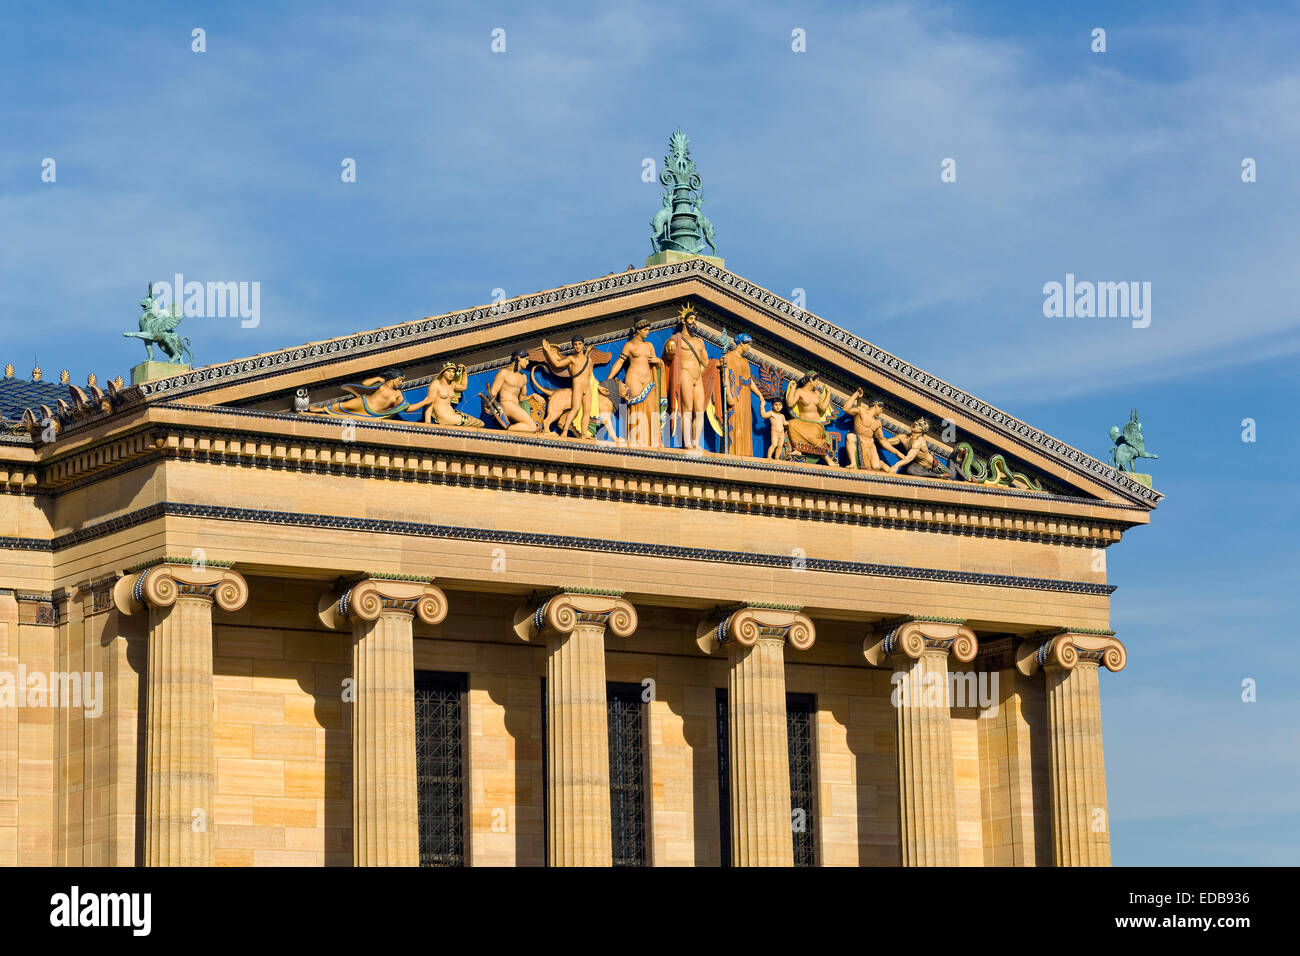 Philadelphia Museum of Art, architectural detail on building exterior, Philadelphia, Pennsylvania - Stock Image